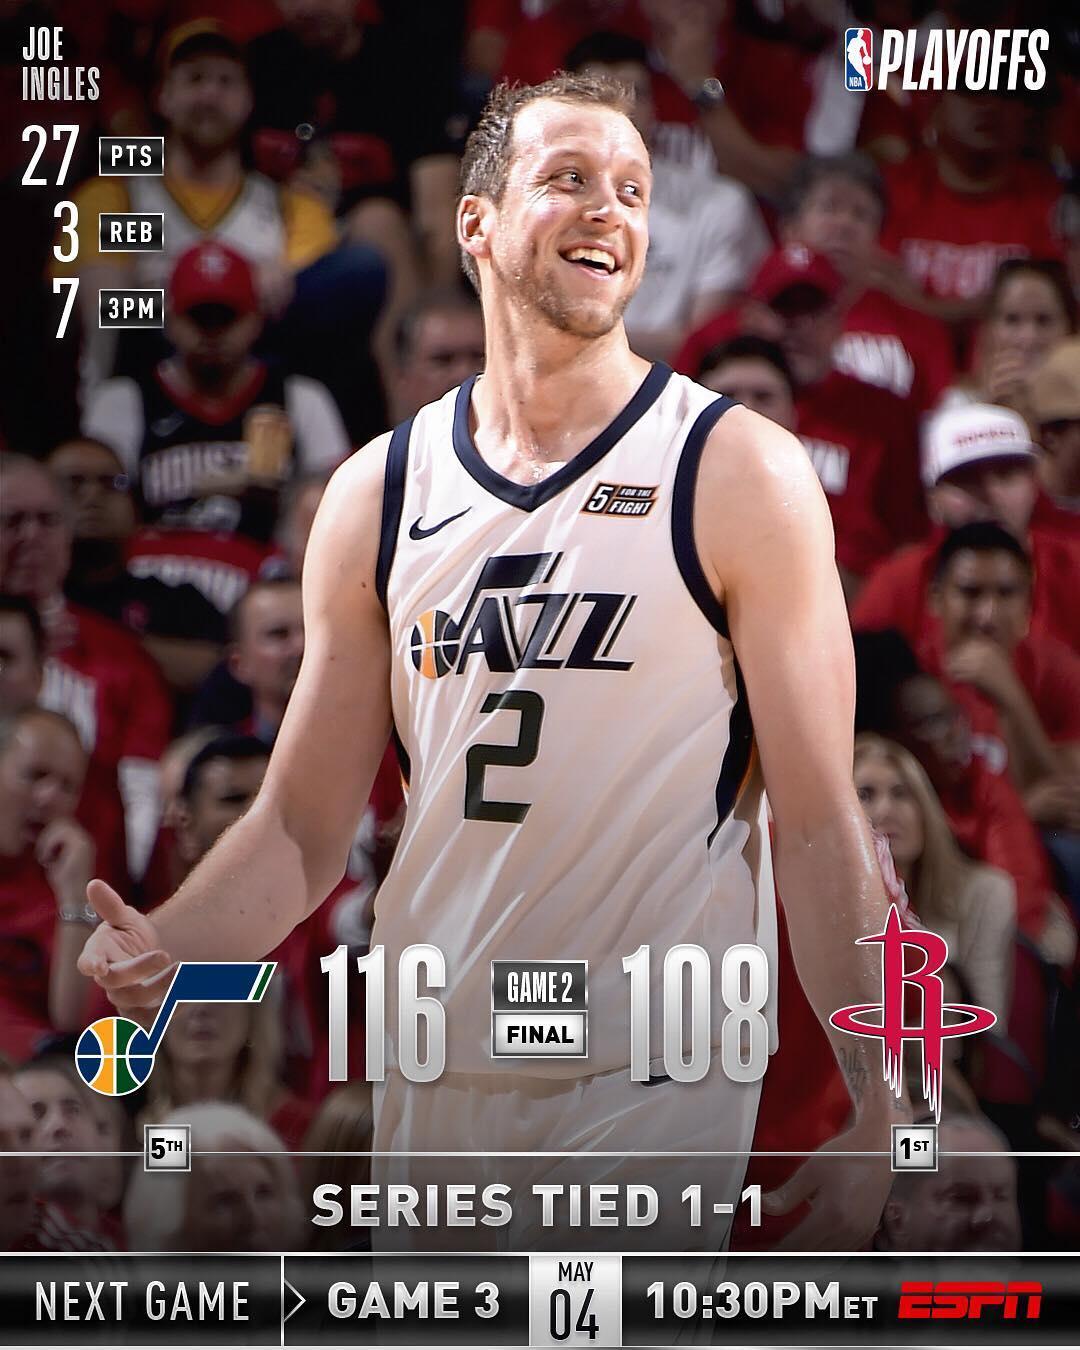 NBA官方发布爵士今日获胜的战报图